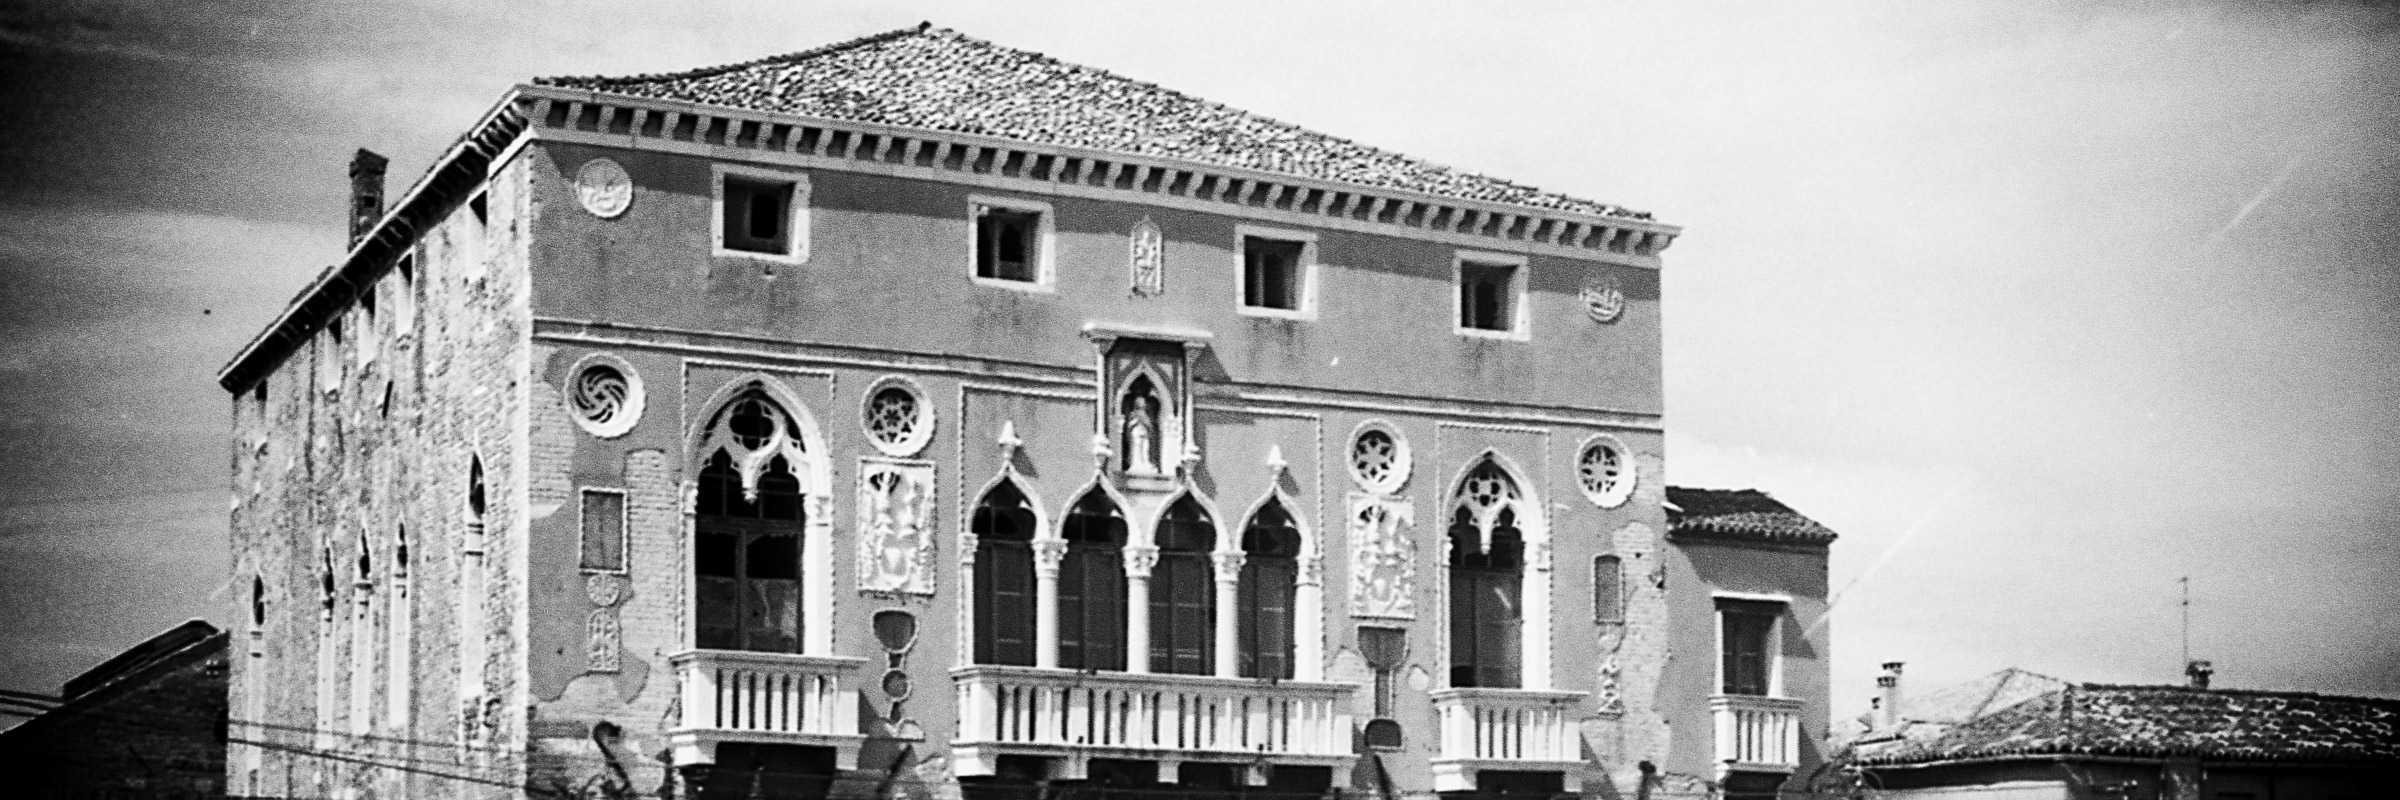 Venezia, 1969 / Paolo Monti. - Strisce: 4, Fotogrammi complessivi: 17 : Negativo b/n, gelatina bromuro d'argento/ pellicola ; 35 mm.